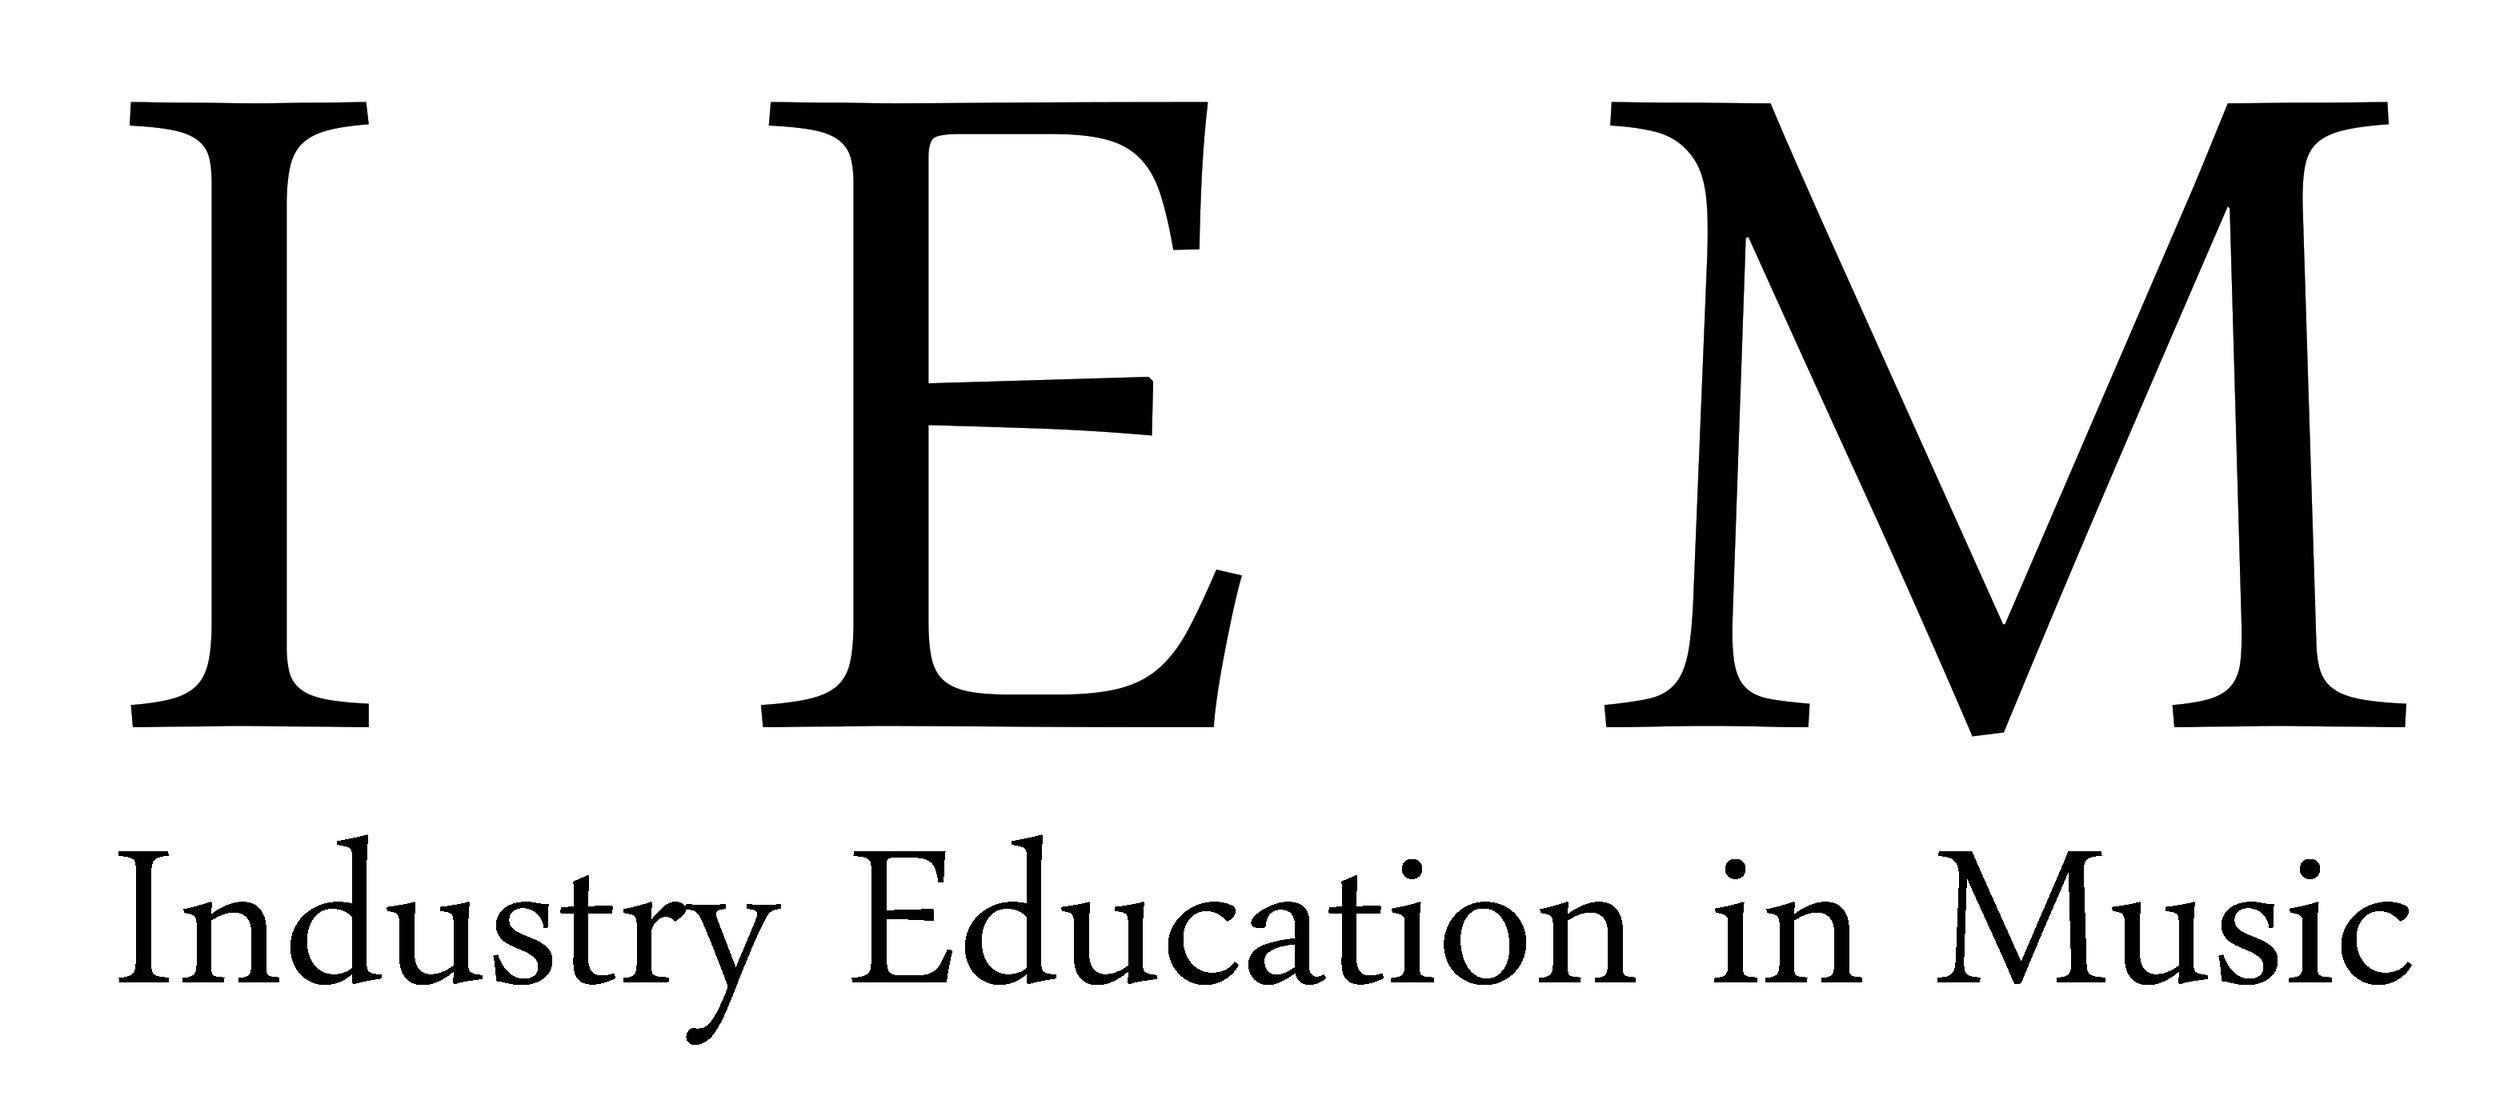 IEM-Logo-Cropped.jpg